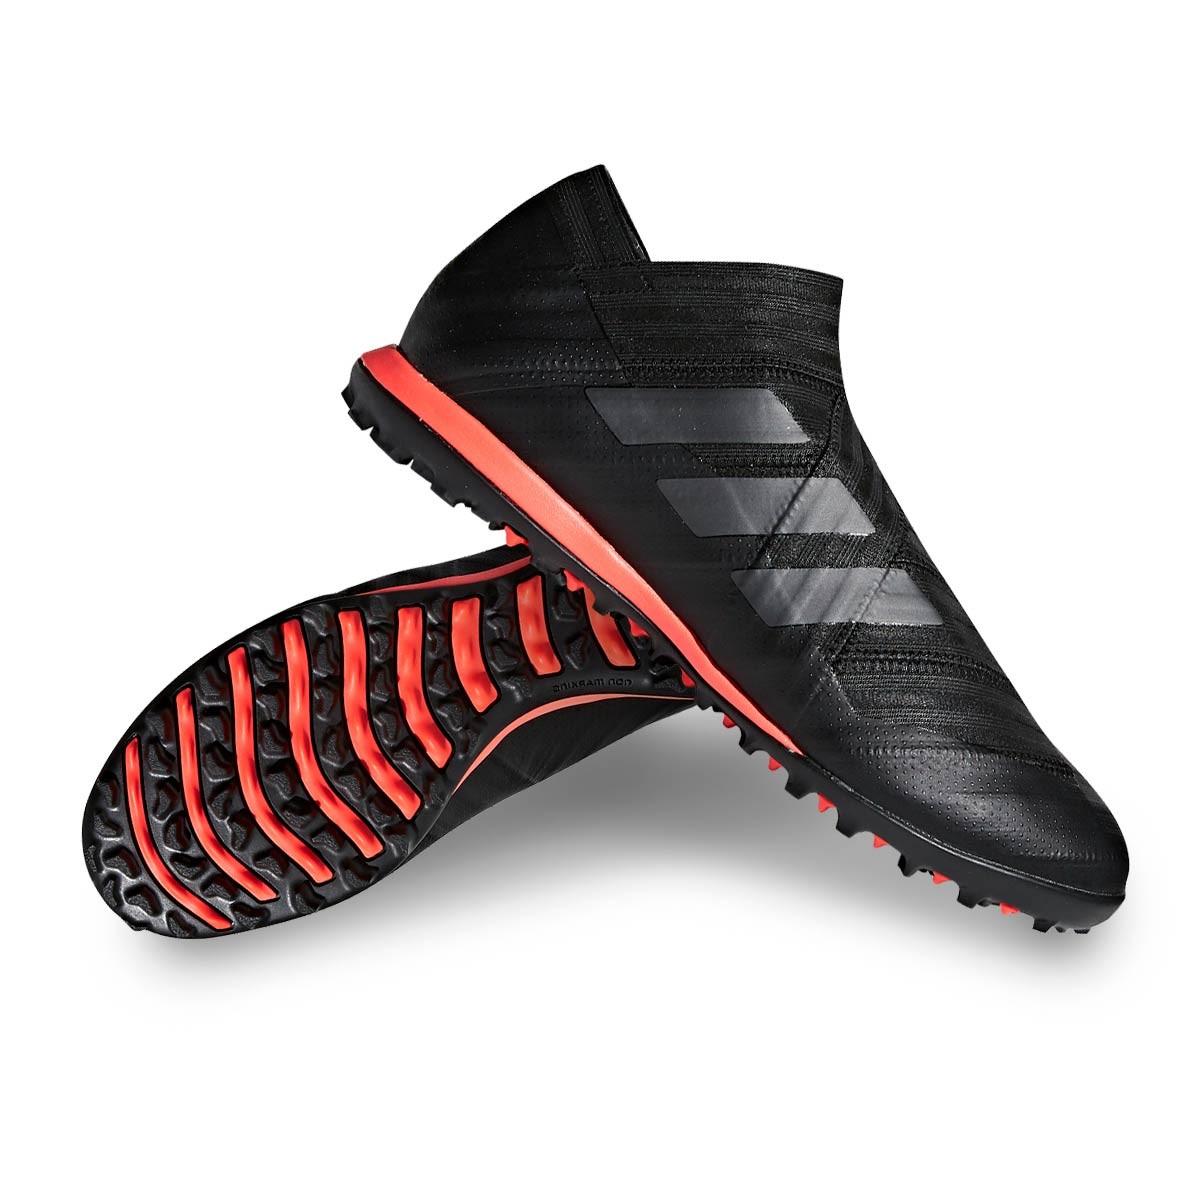 59b16114afa9 Football Boot adidas Nemeziz Tango 17+ 360 Agility Turf Core black ...